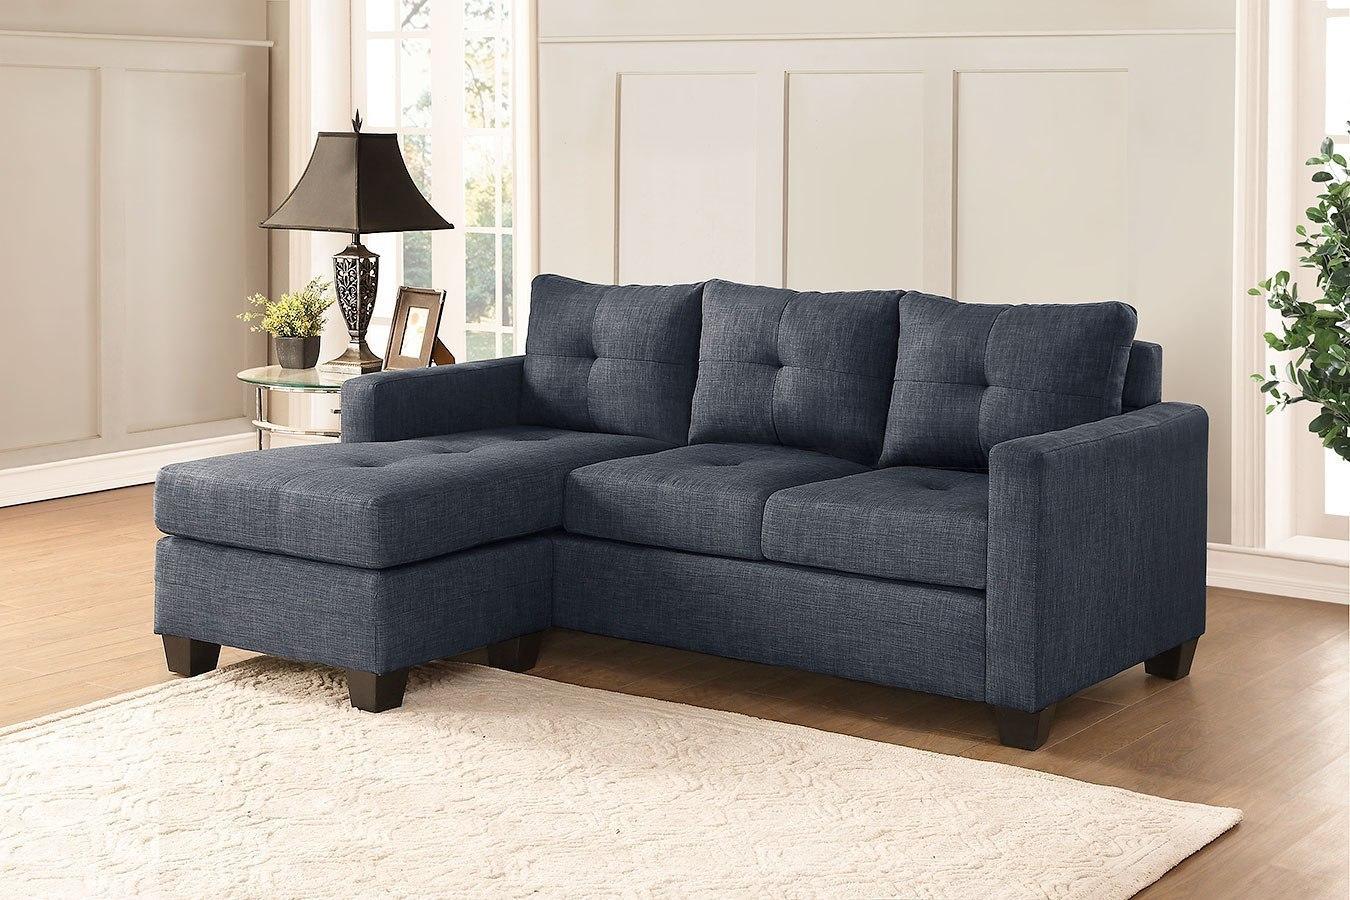 Phelps Reversible Sofa Chaise (Dark Gray) By Homelegance